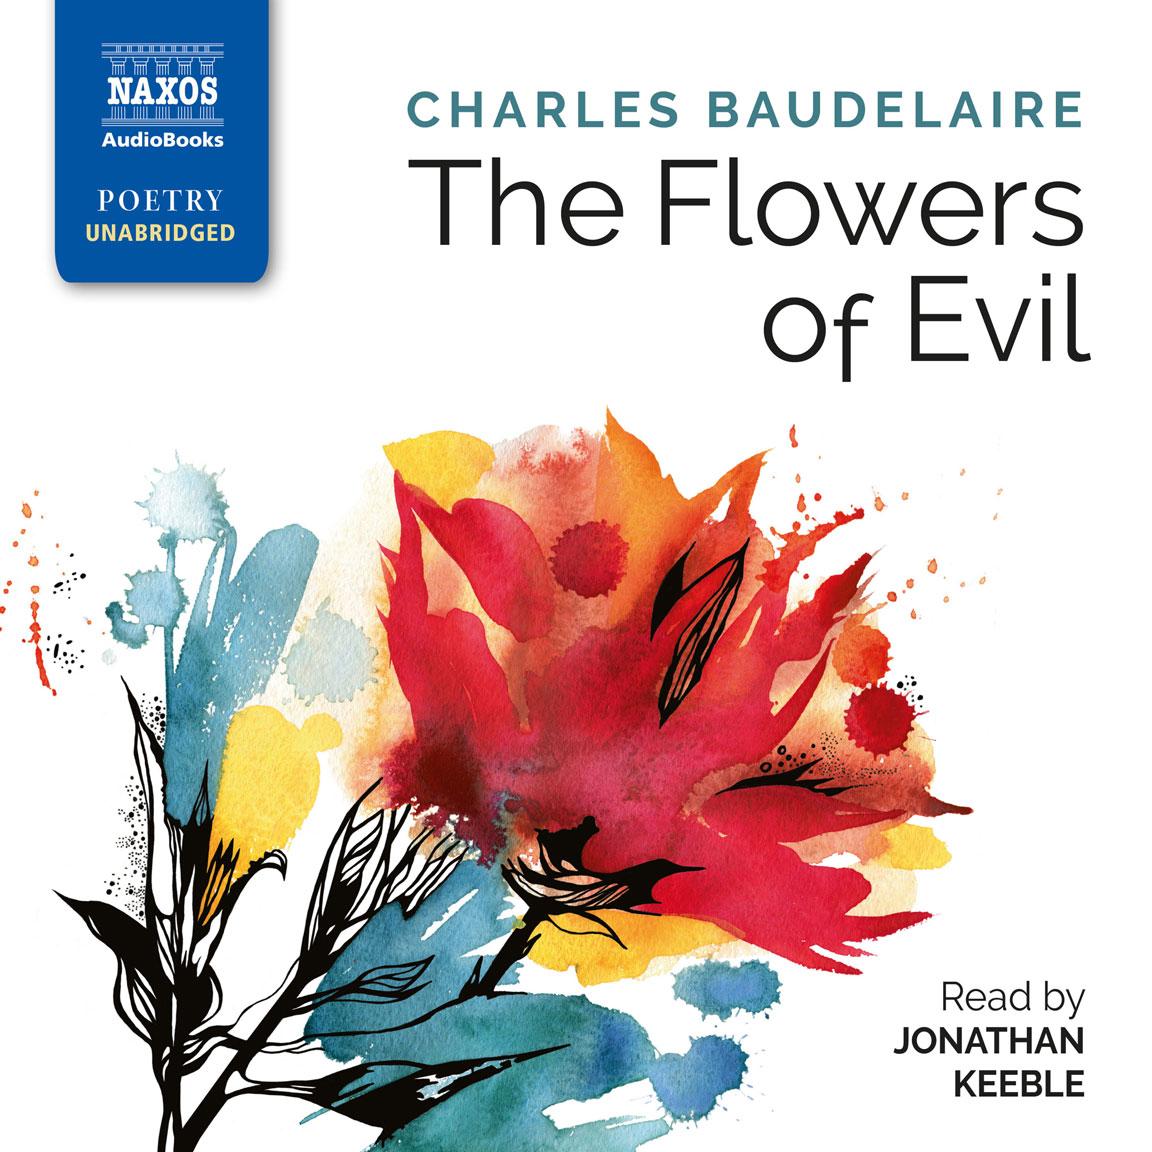 The Flowers of Evil (unabridged)